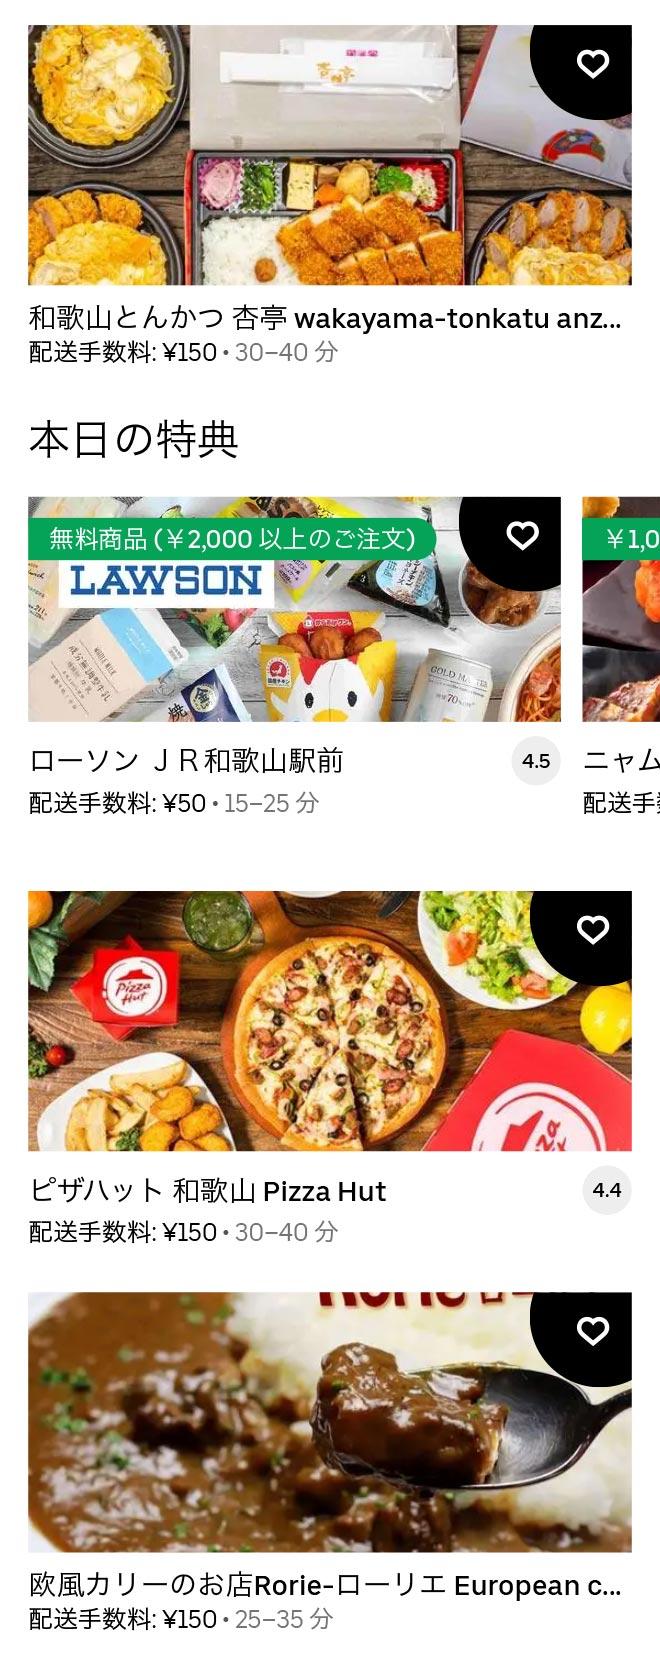 U wakayama menu 2104 12